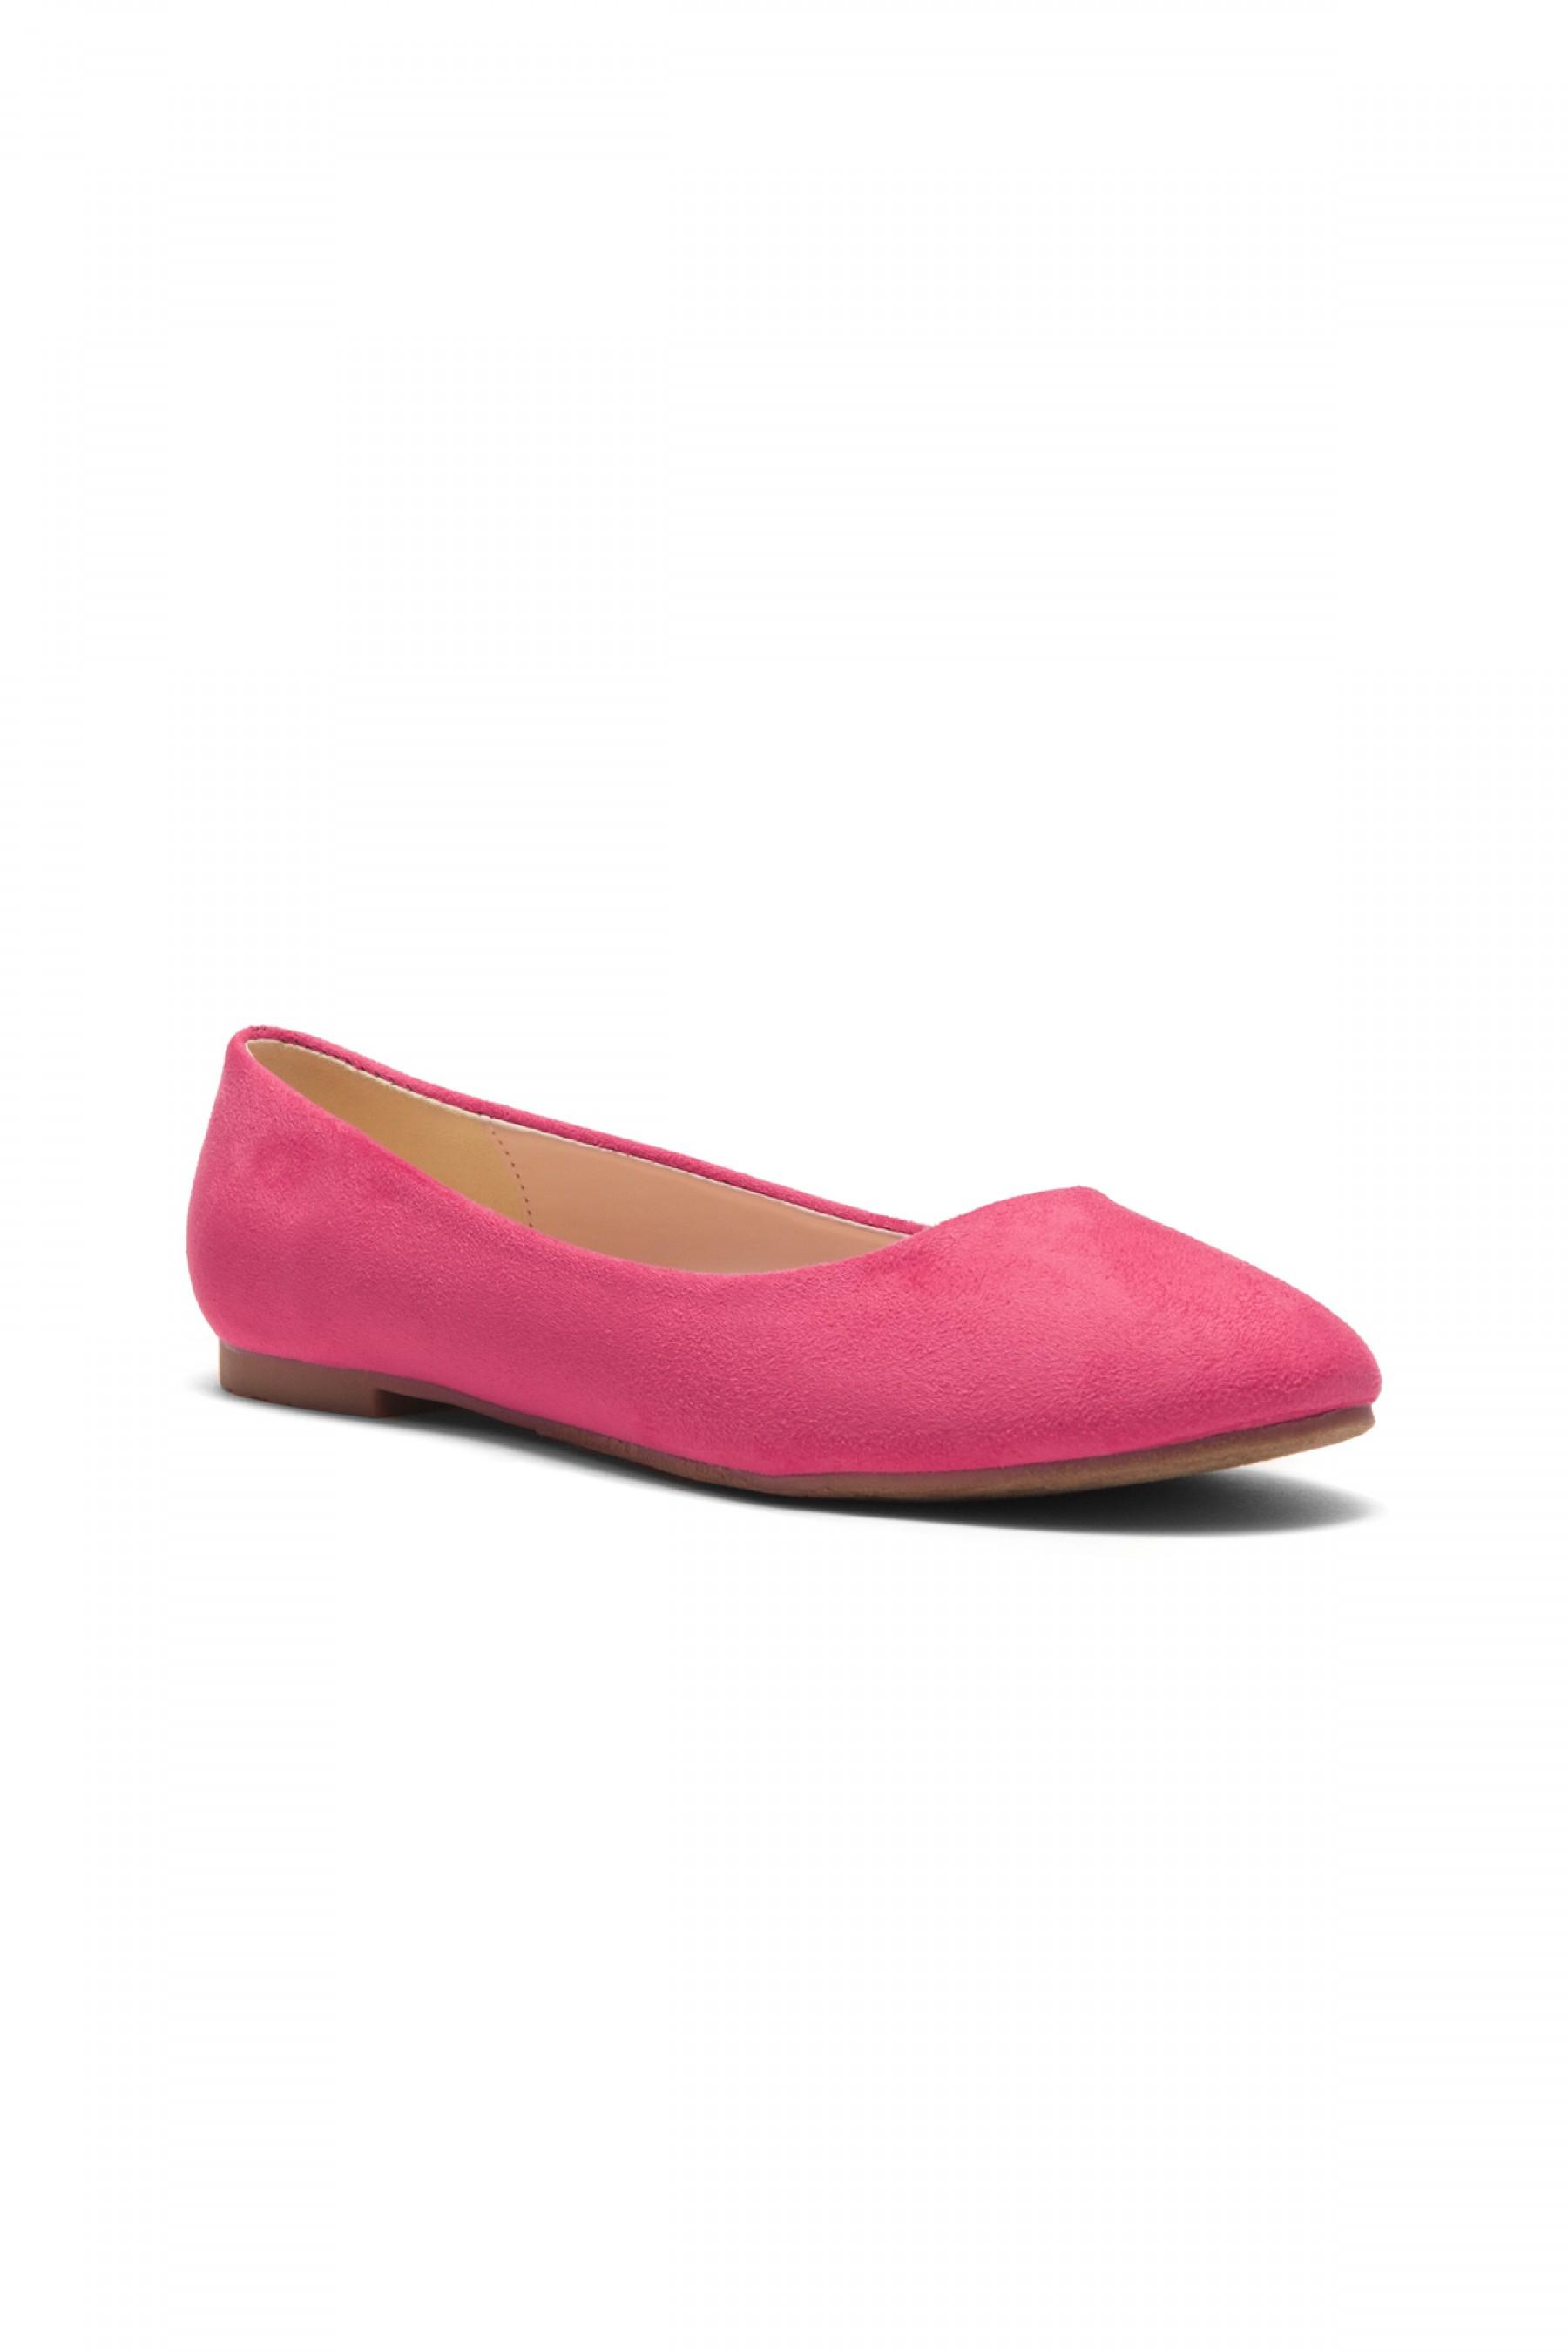 HerStyle Women's Manmade Sammba Colorful Ballet Flat (Fuchsia)